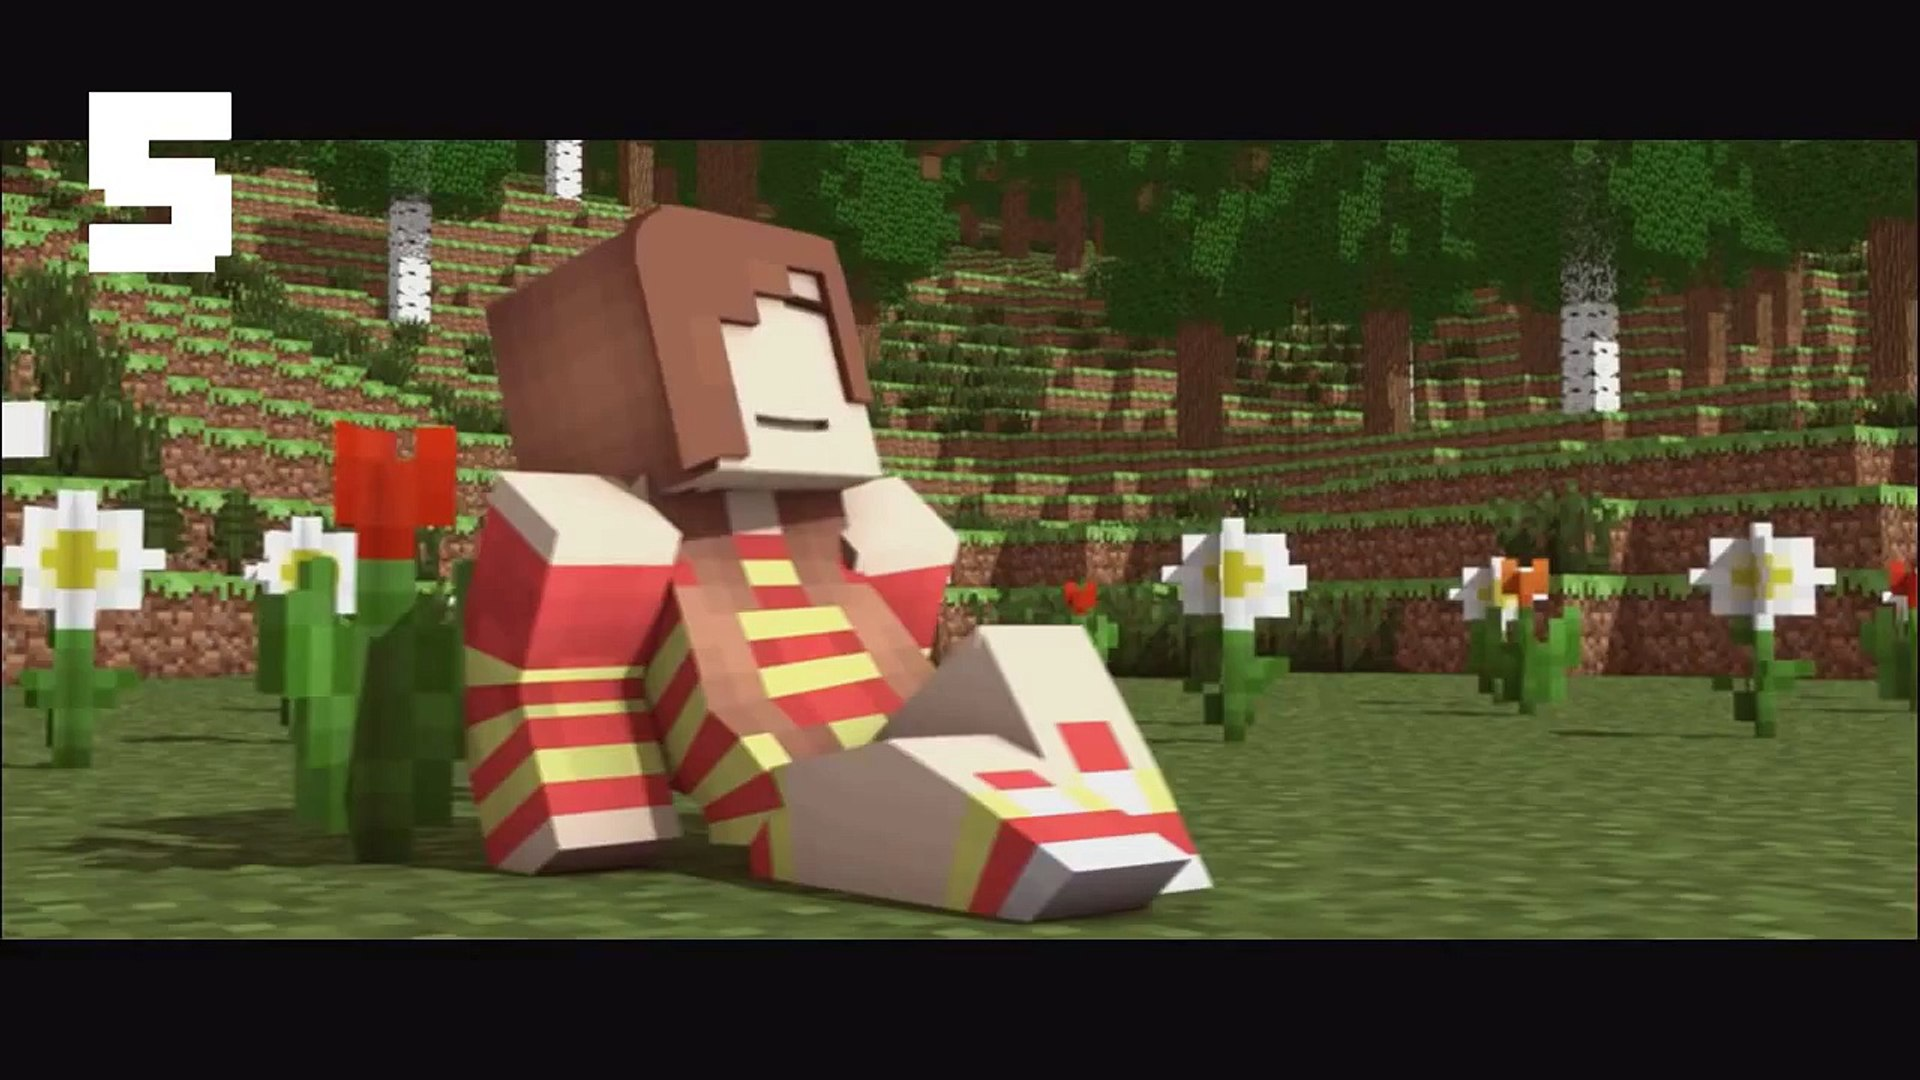 Top 5 Minecraft Songs Parodies Animations - Best Minecraft Song Animation Parody January 2015!